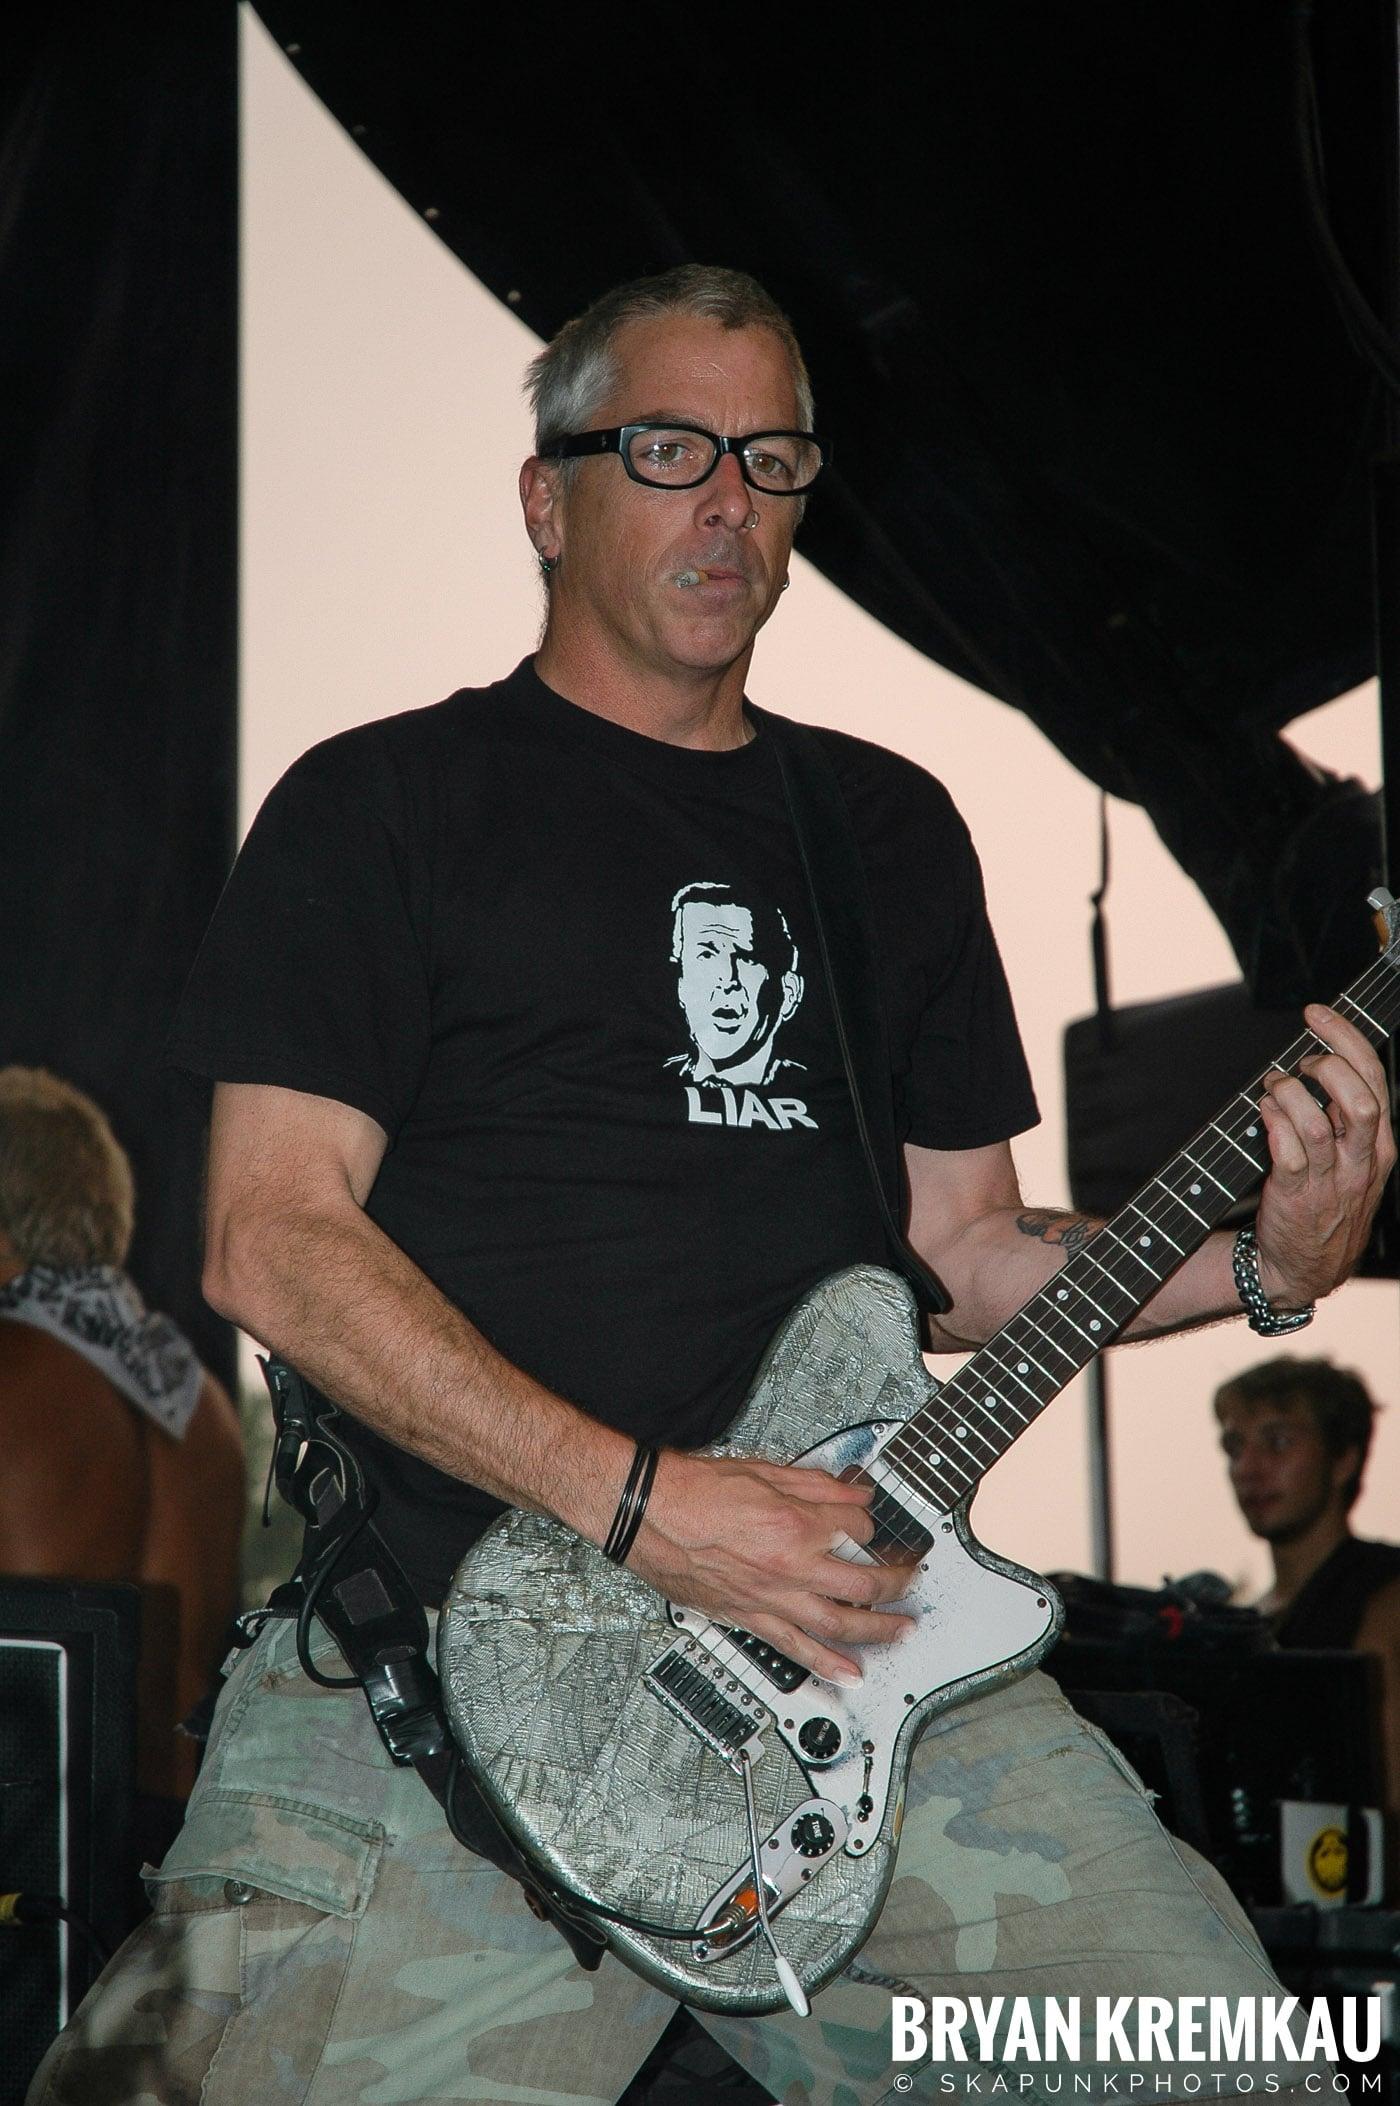 The Offspring @ Warped Tour 05, NYC - 8.12.05 (18)